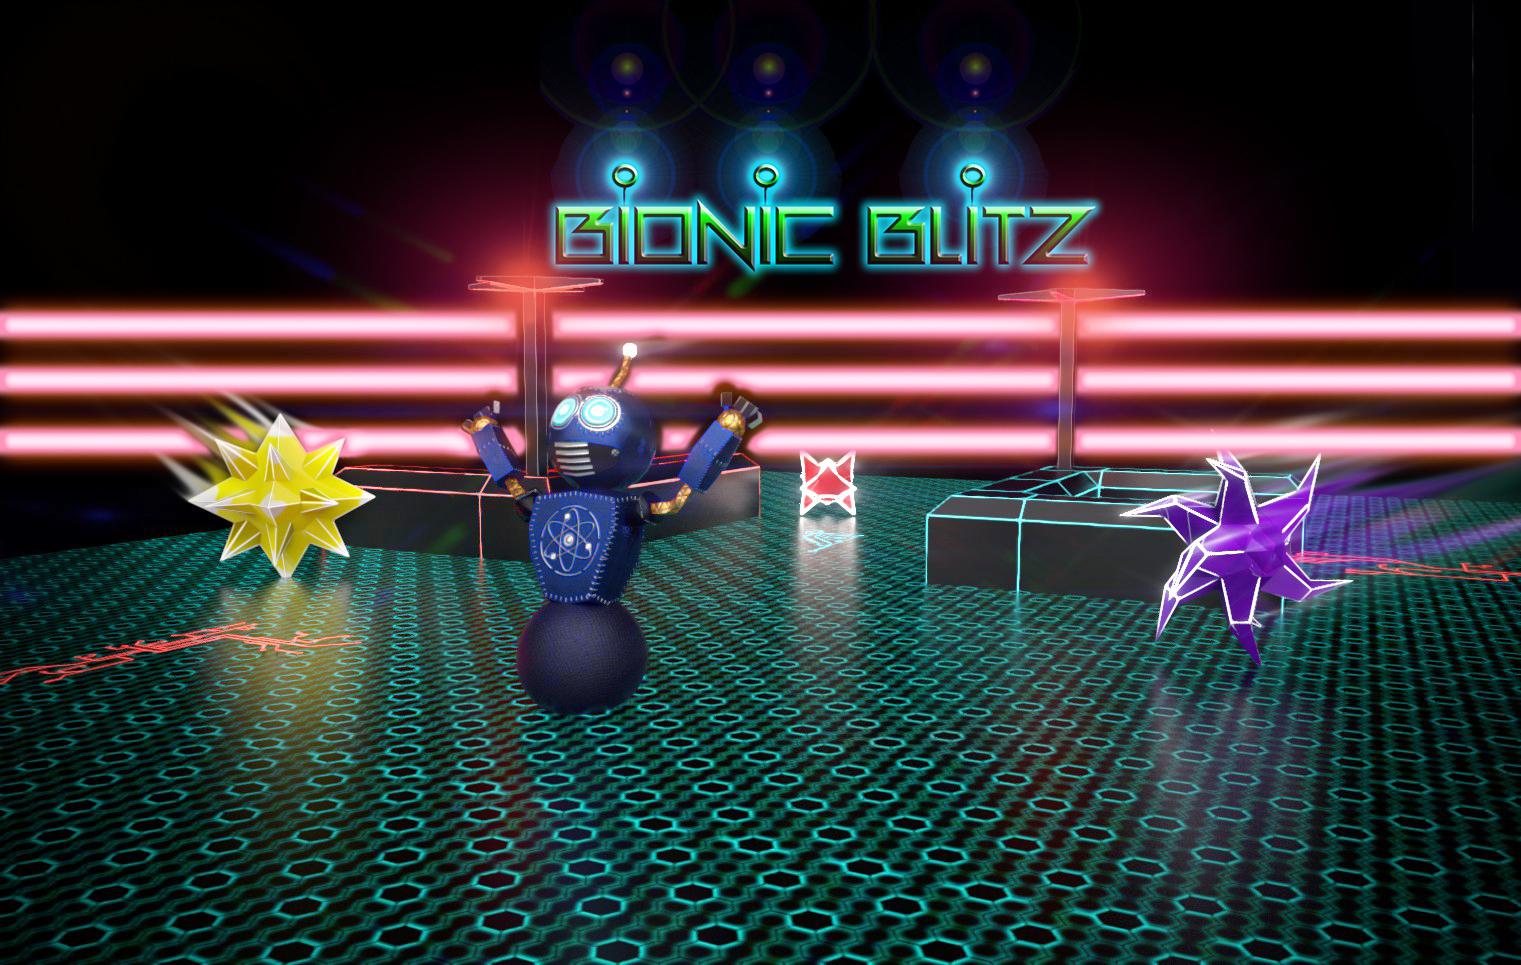 BionicBlitz